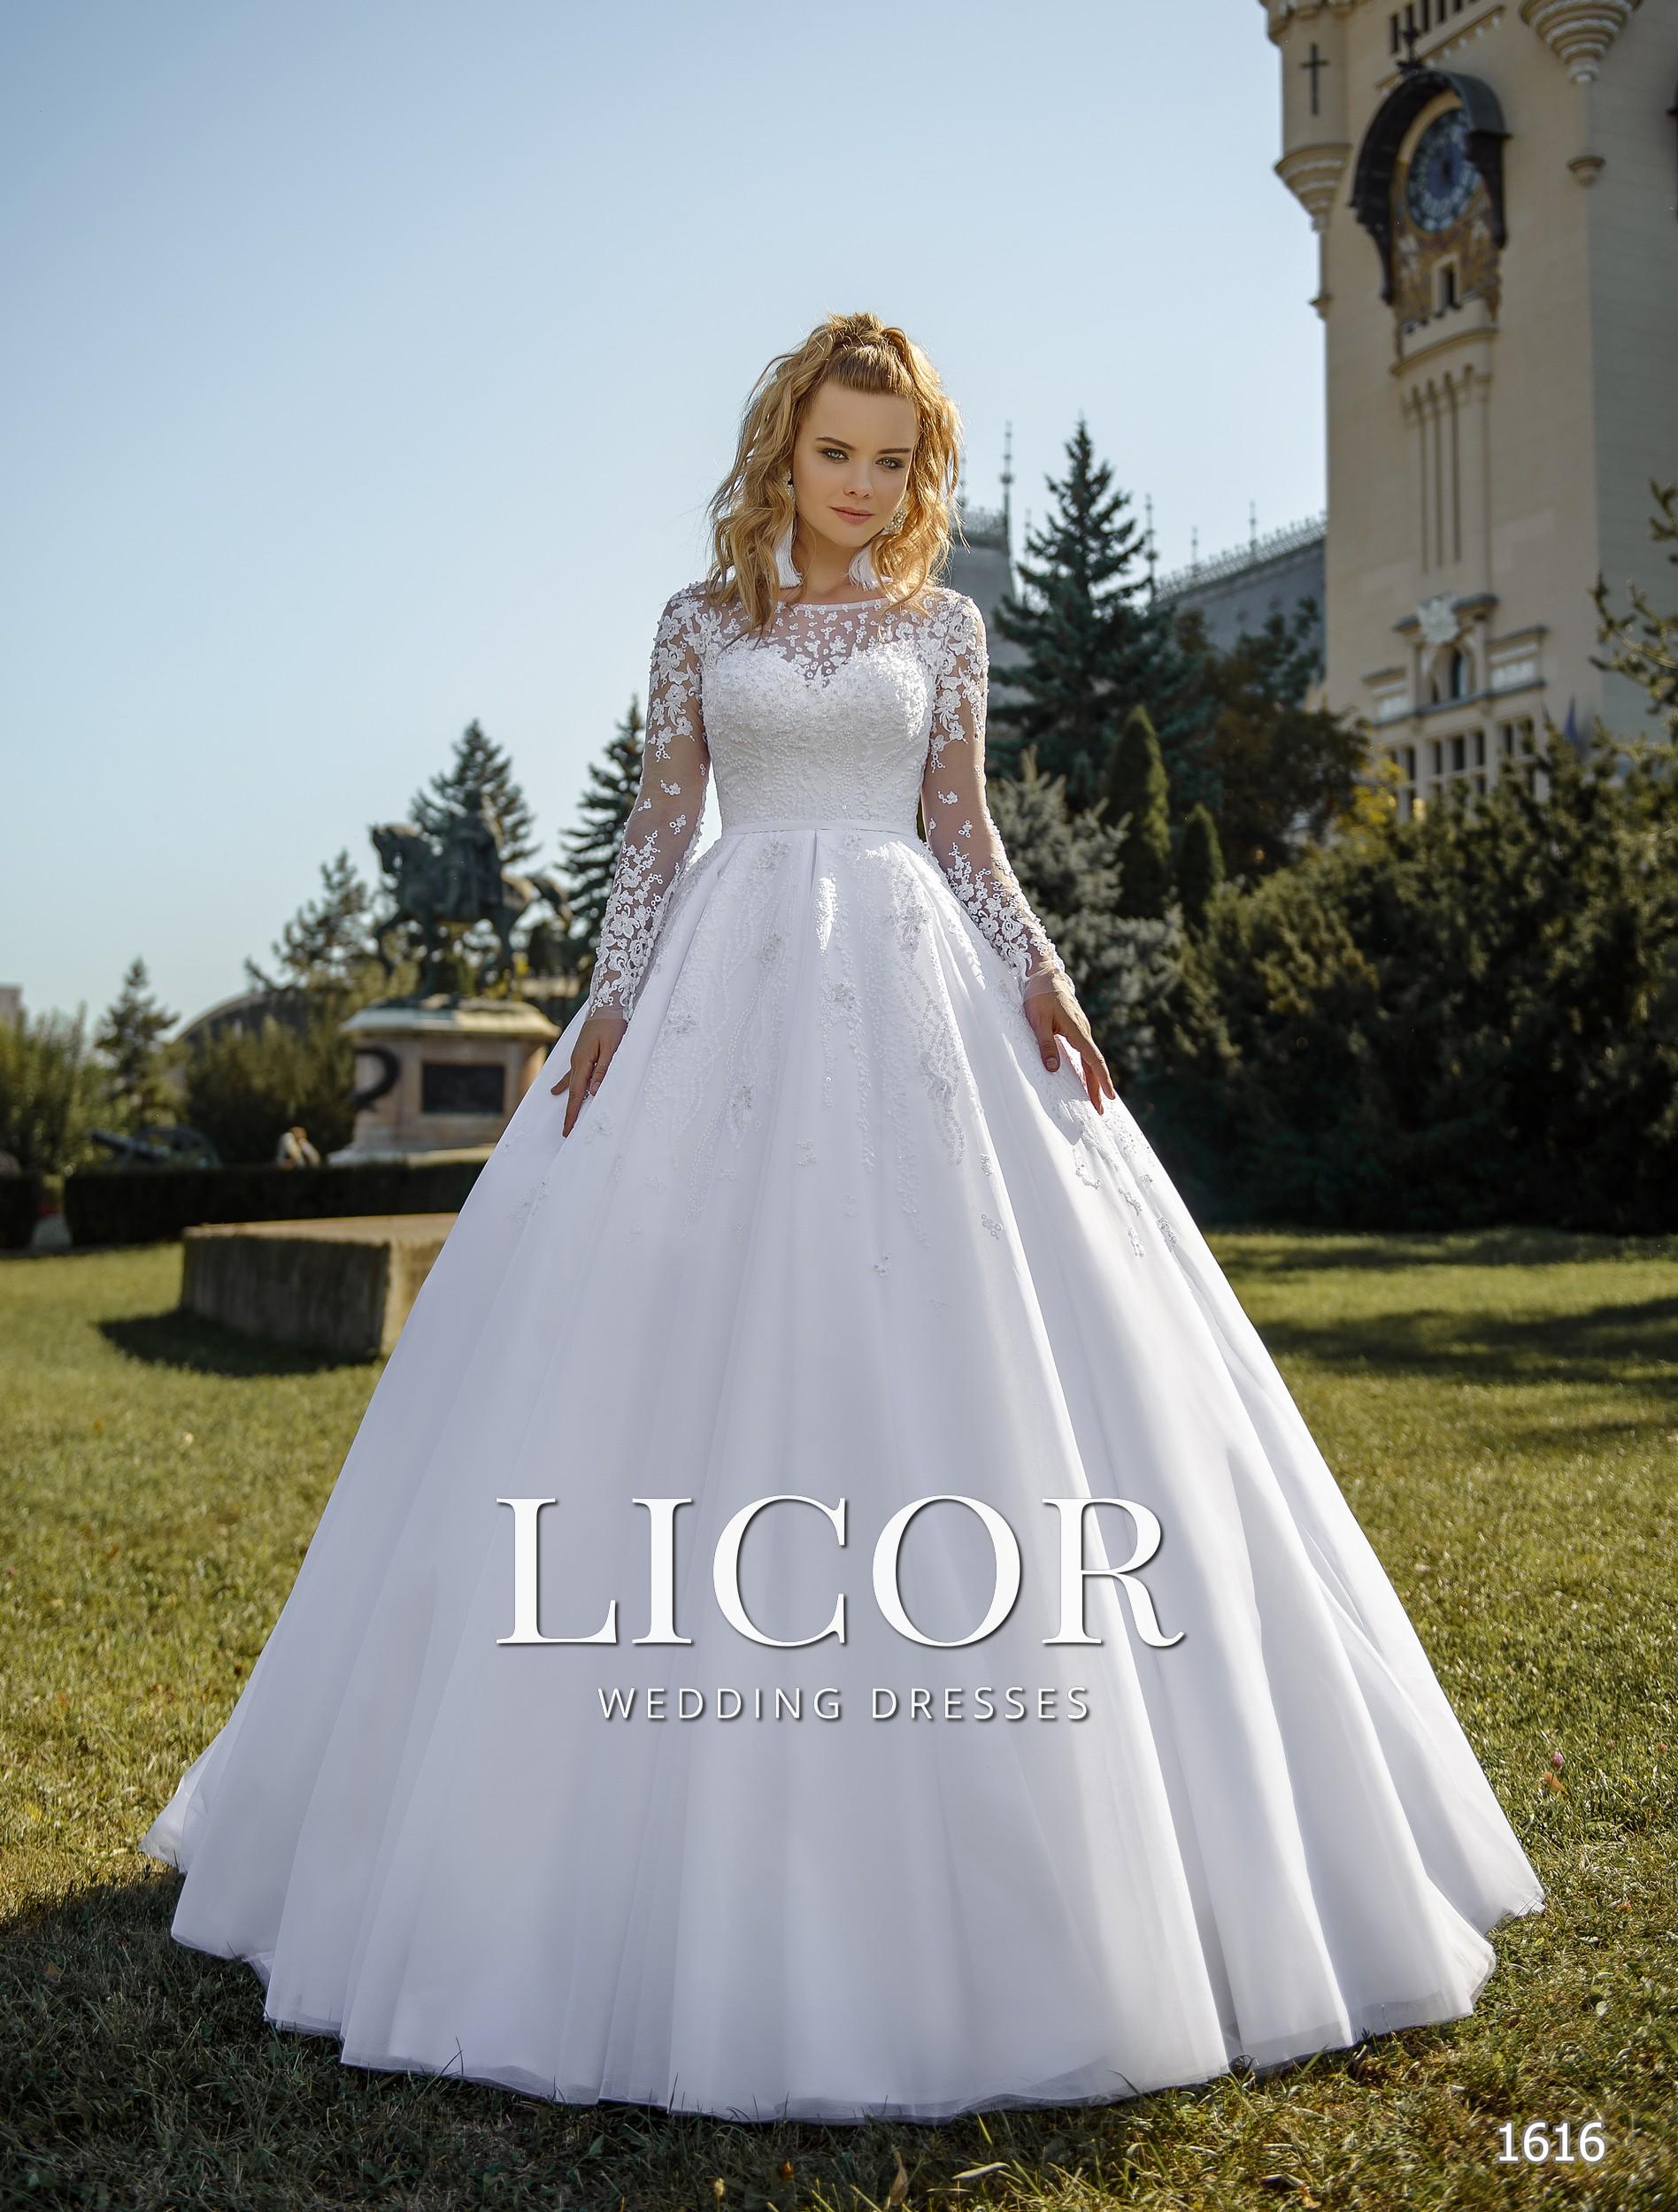 https://licor.com.ua/images/stories/virtuemart/product/1616(1).jpg